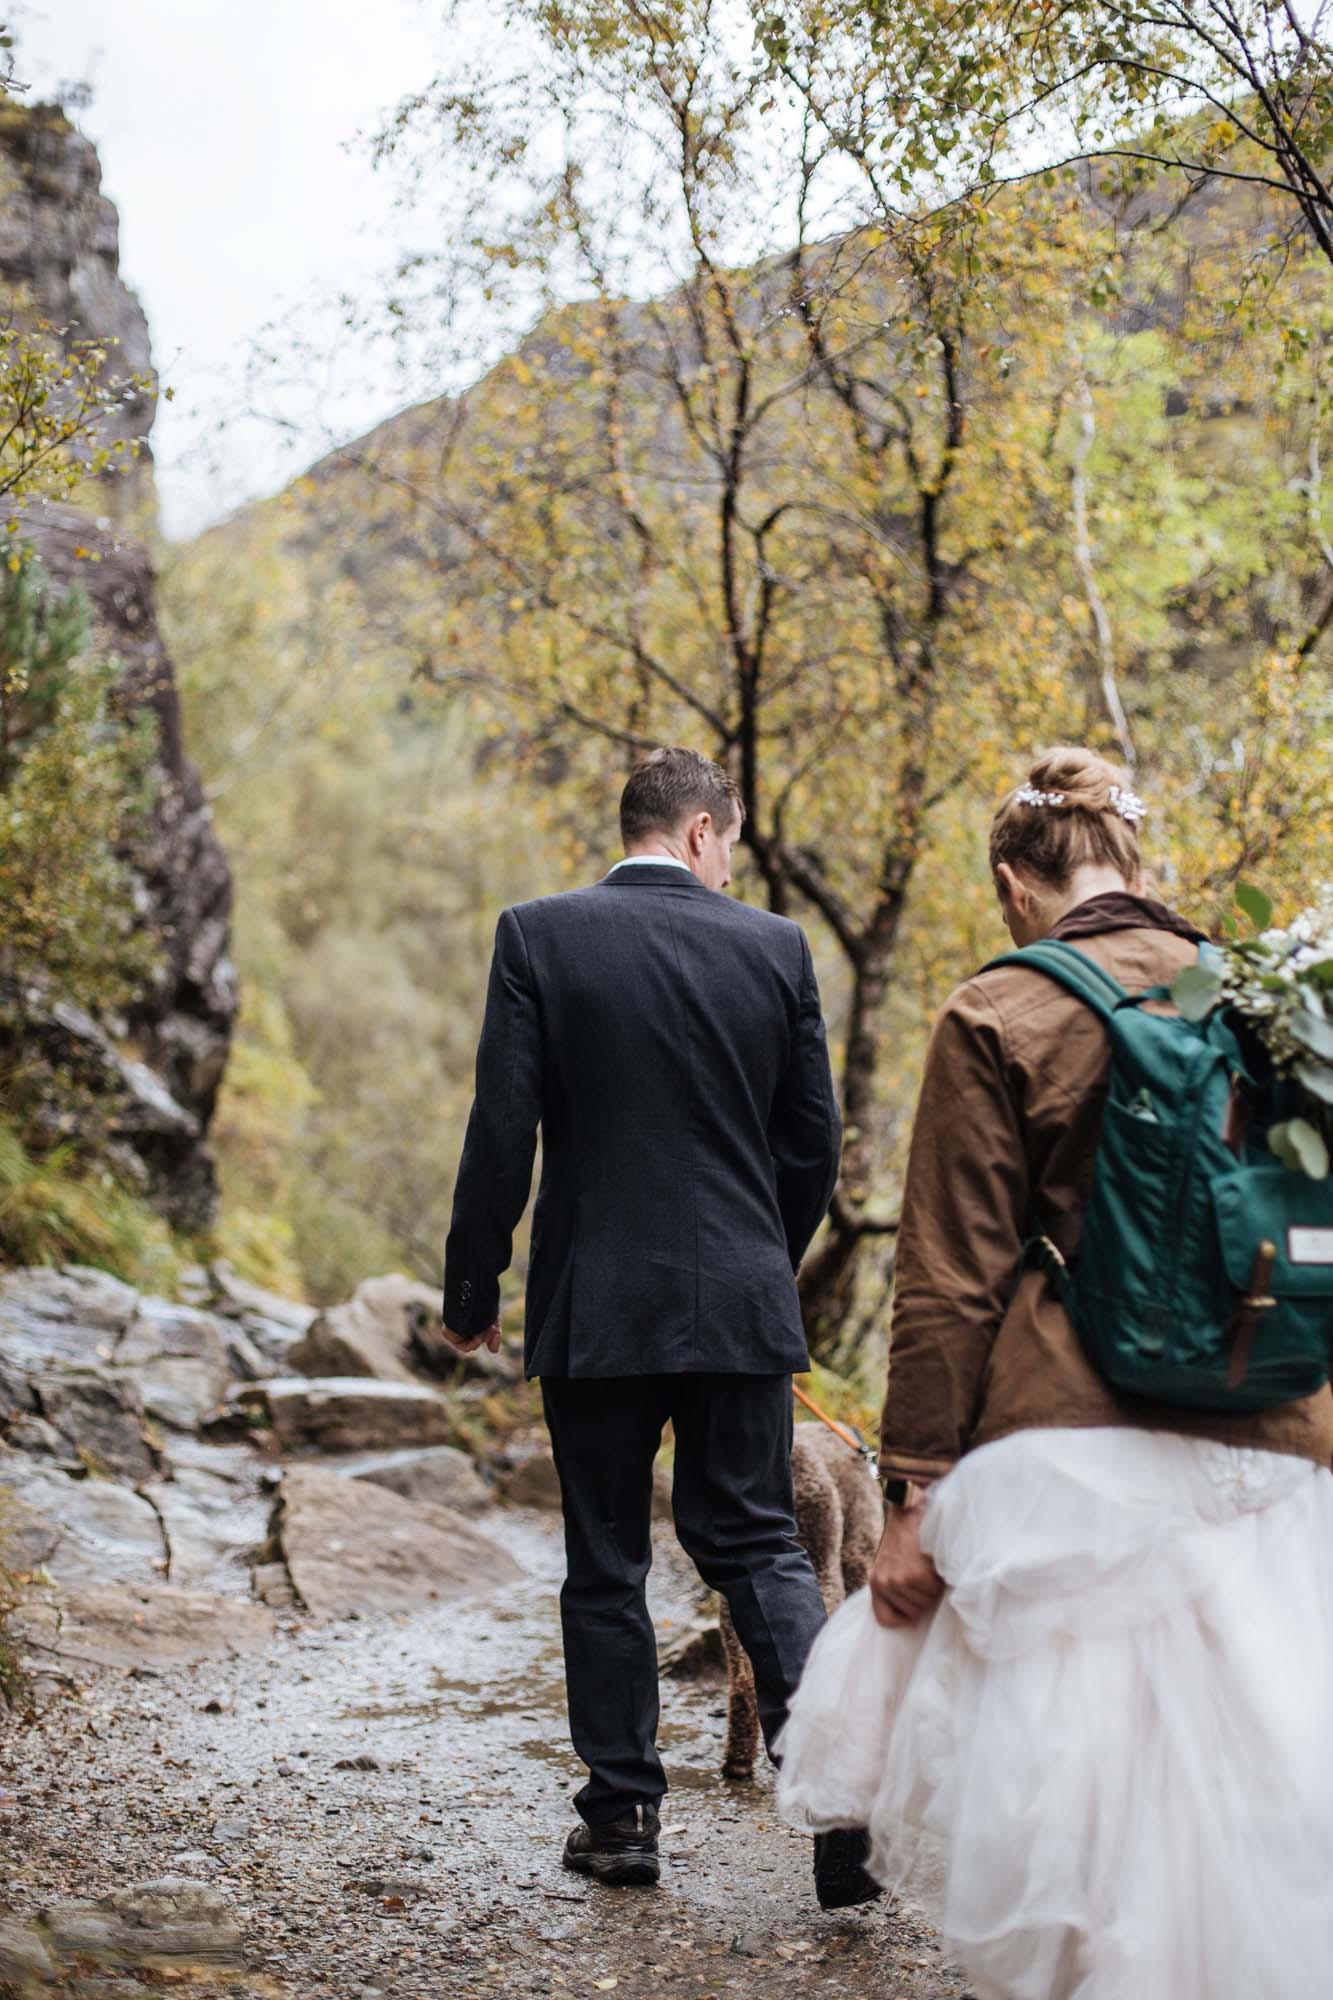 Hiking Elopement in Scotland